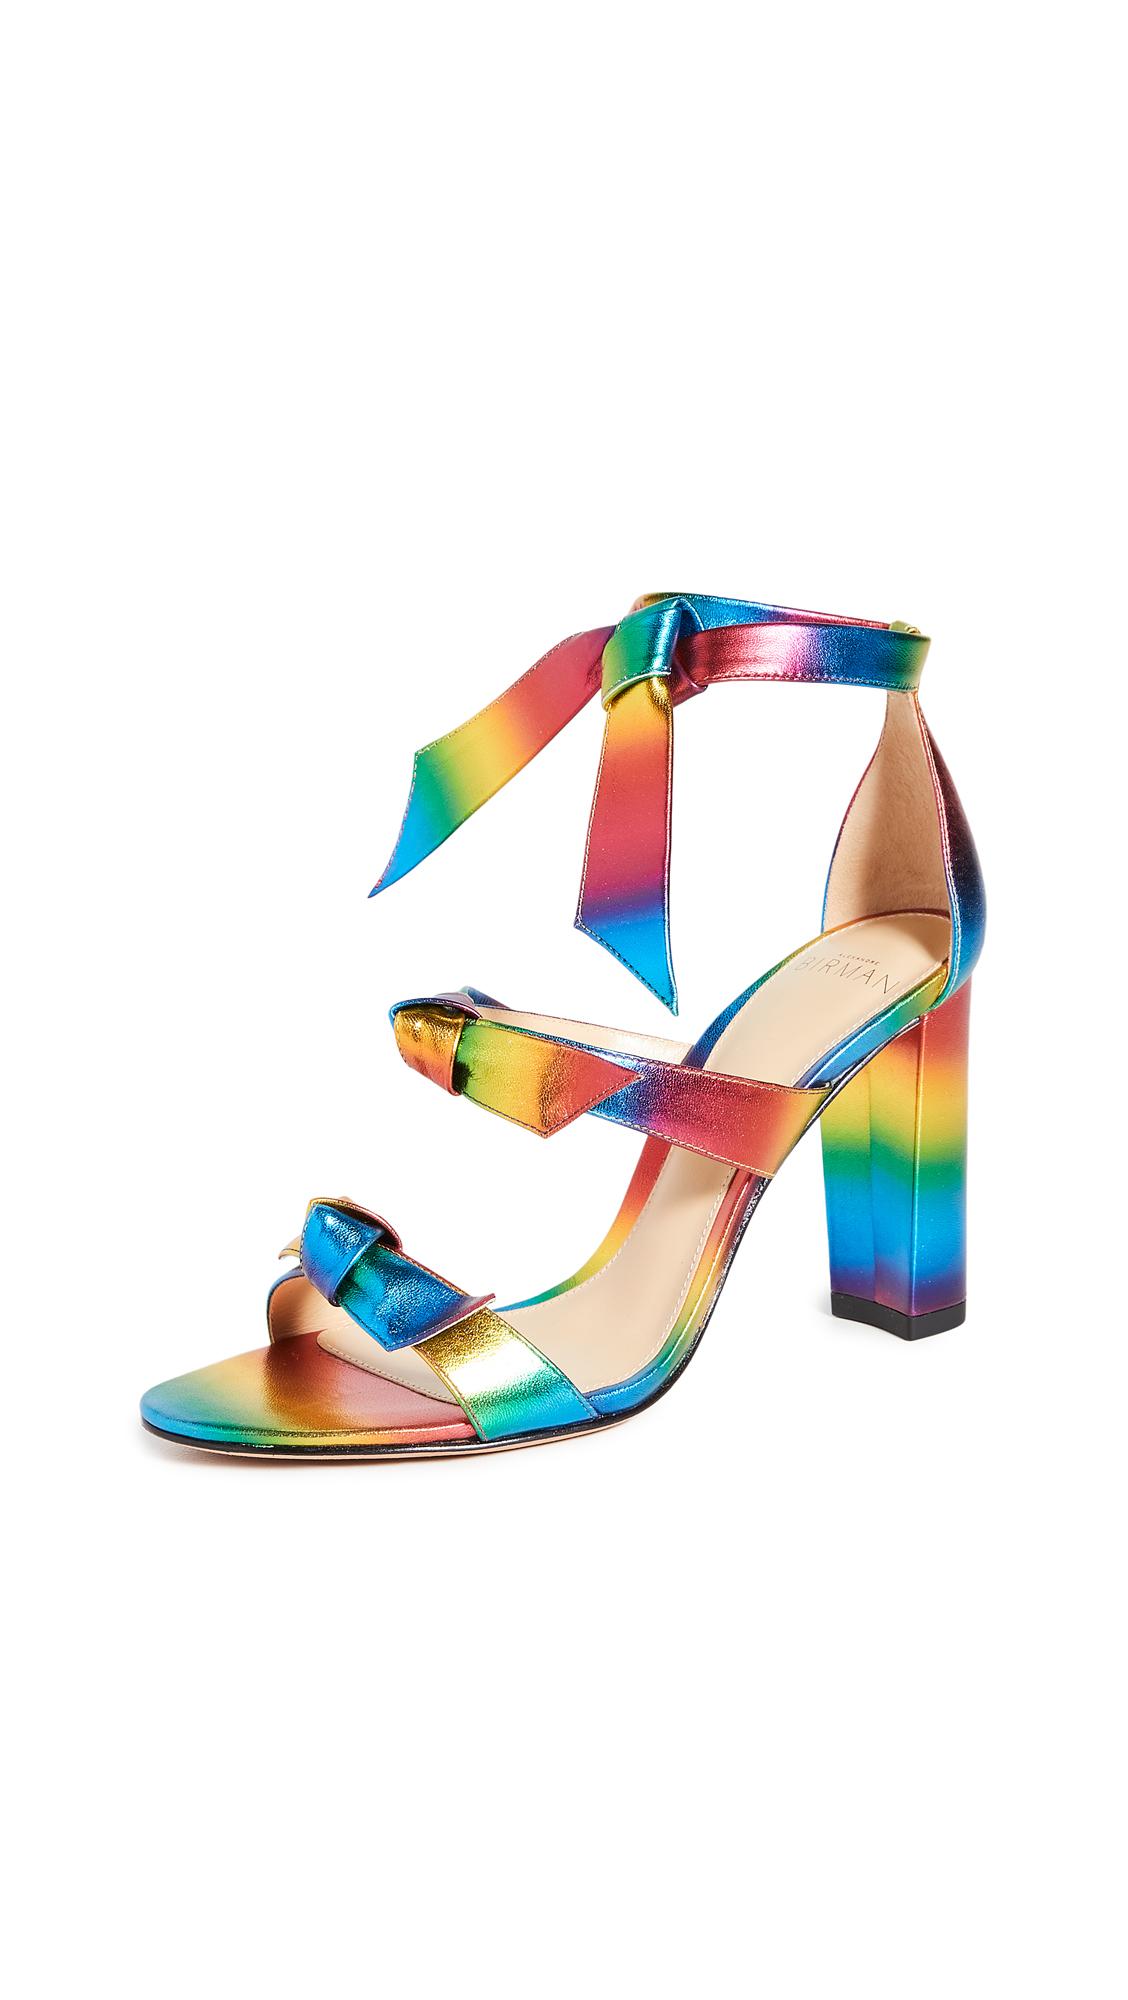 Buy Alexandre Birman 90mm Lolita Block Sandals online, shop Alexandre Birman